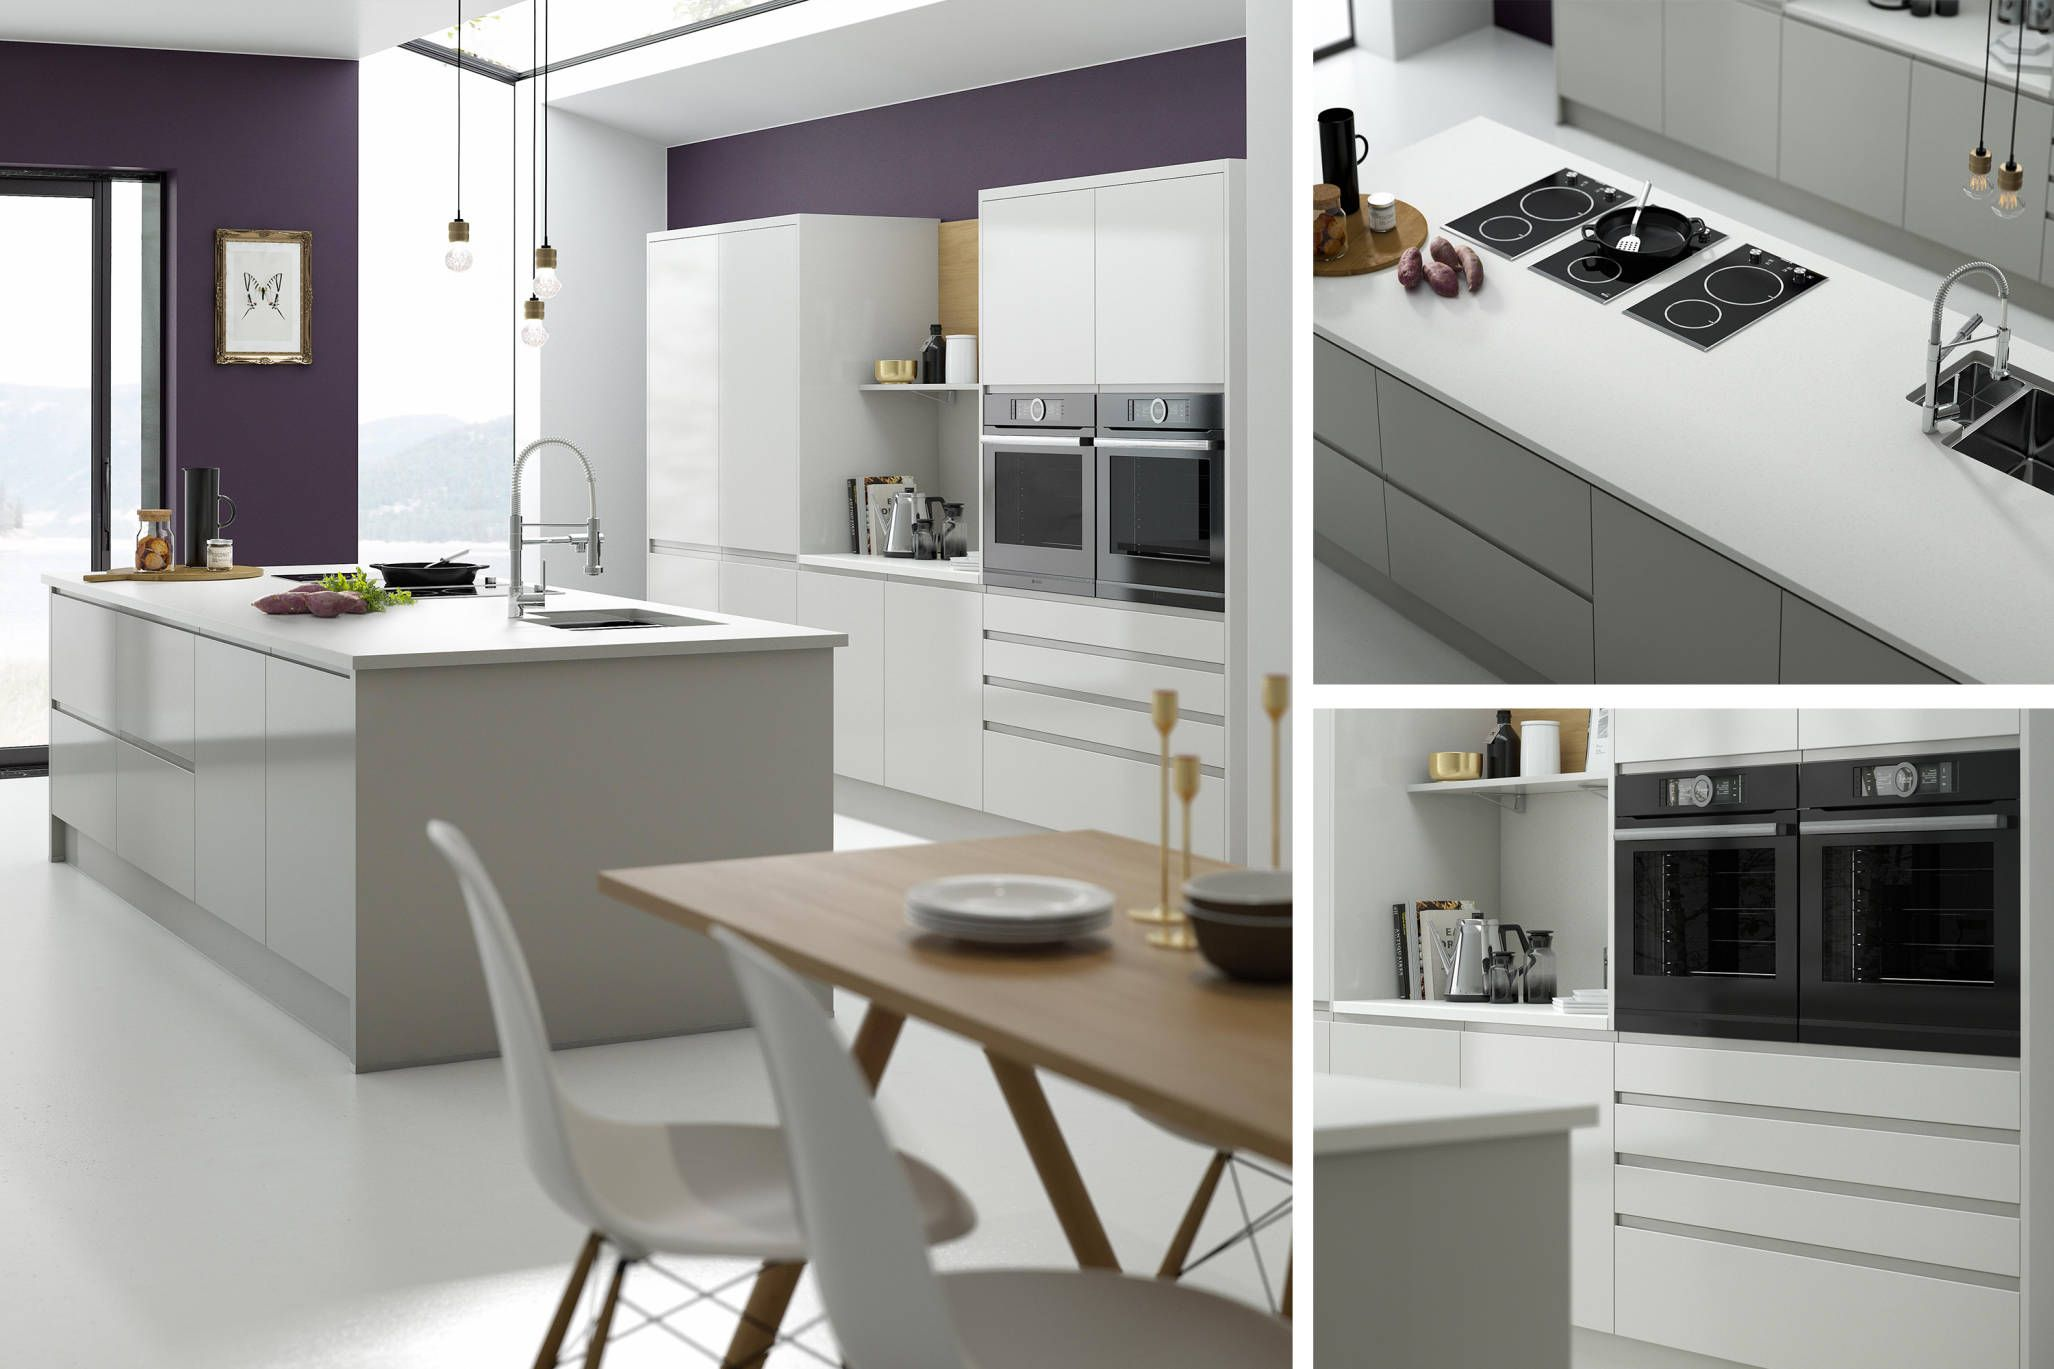 Handleless Pebble Gloss image 1 Handleless kitchen, Wren